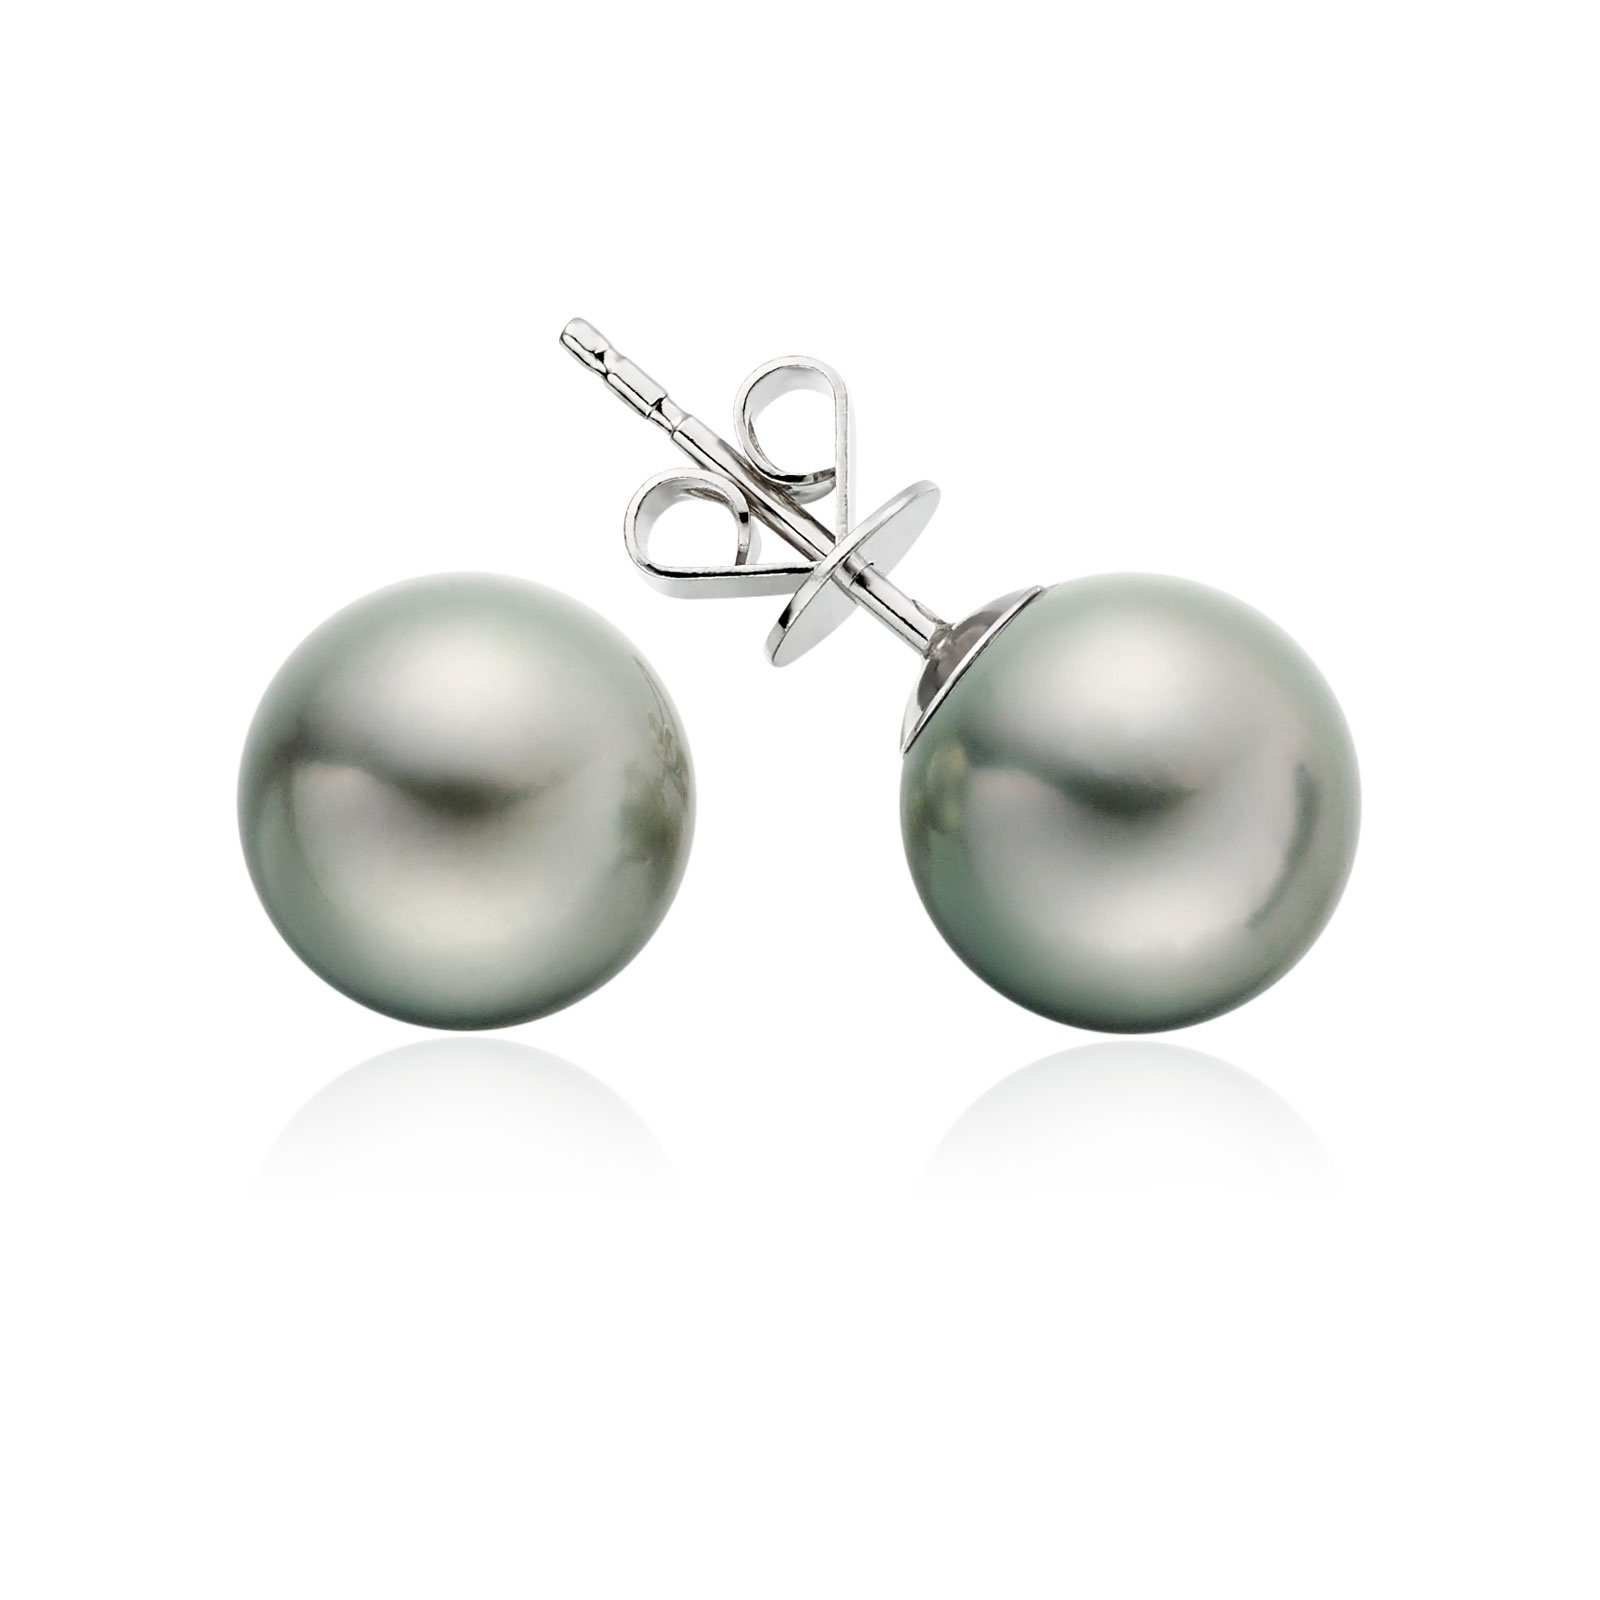 8dc2472b5 Grey Tahitian Pearl Stud Earrings in White Gold | Winterson